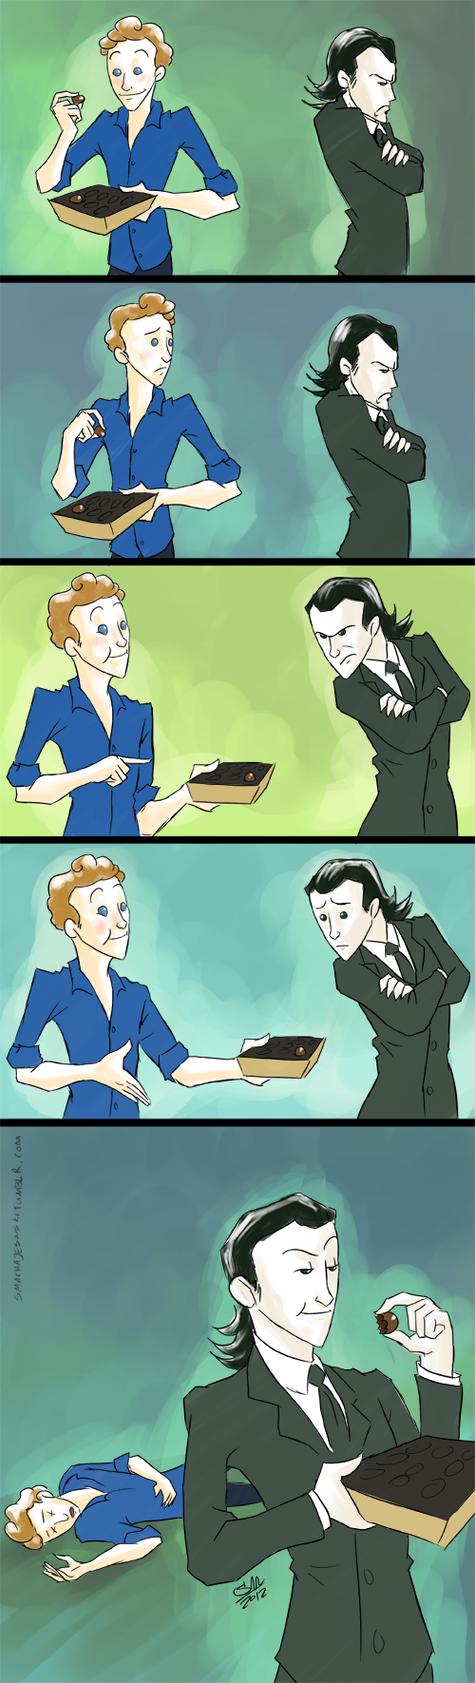 Loki and the Loon Fanart by SMachajewski